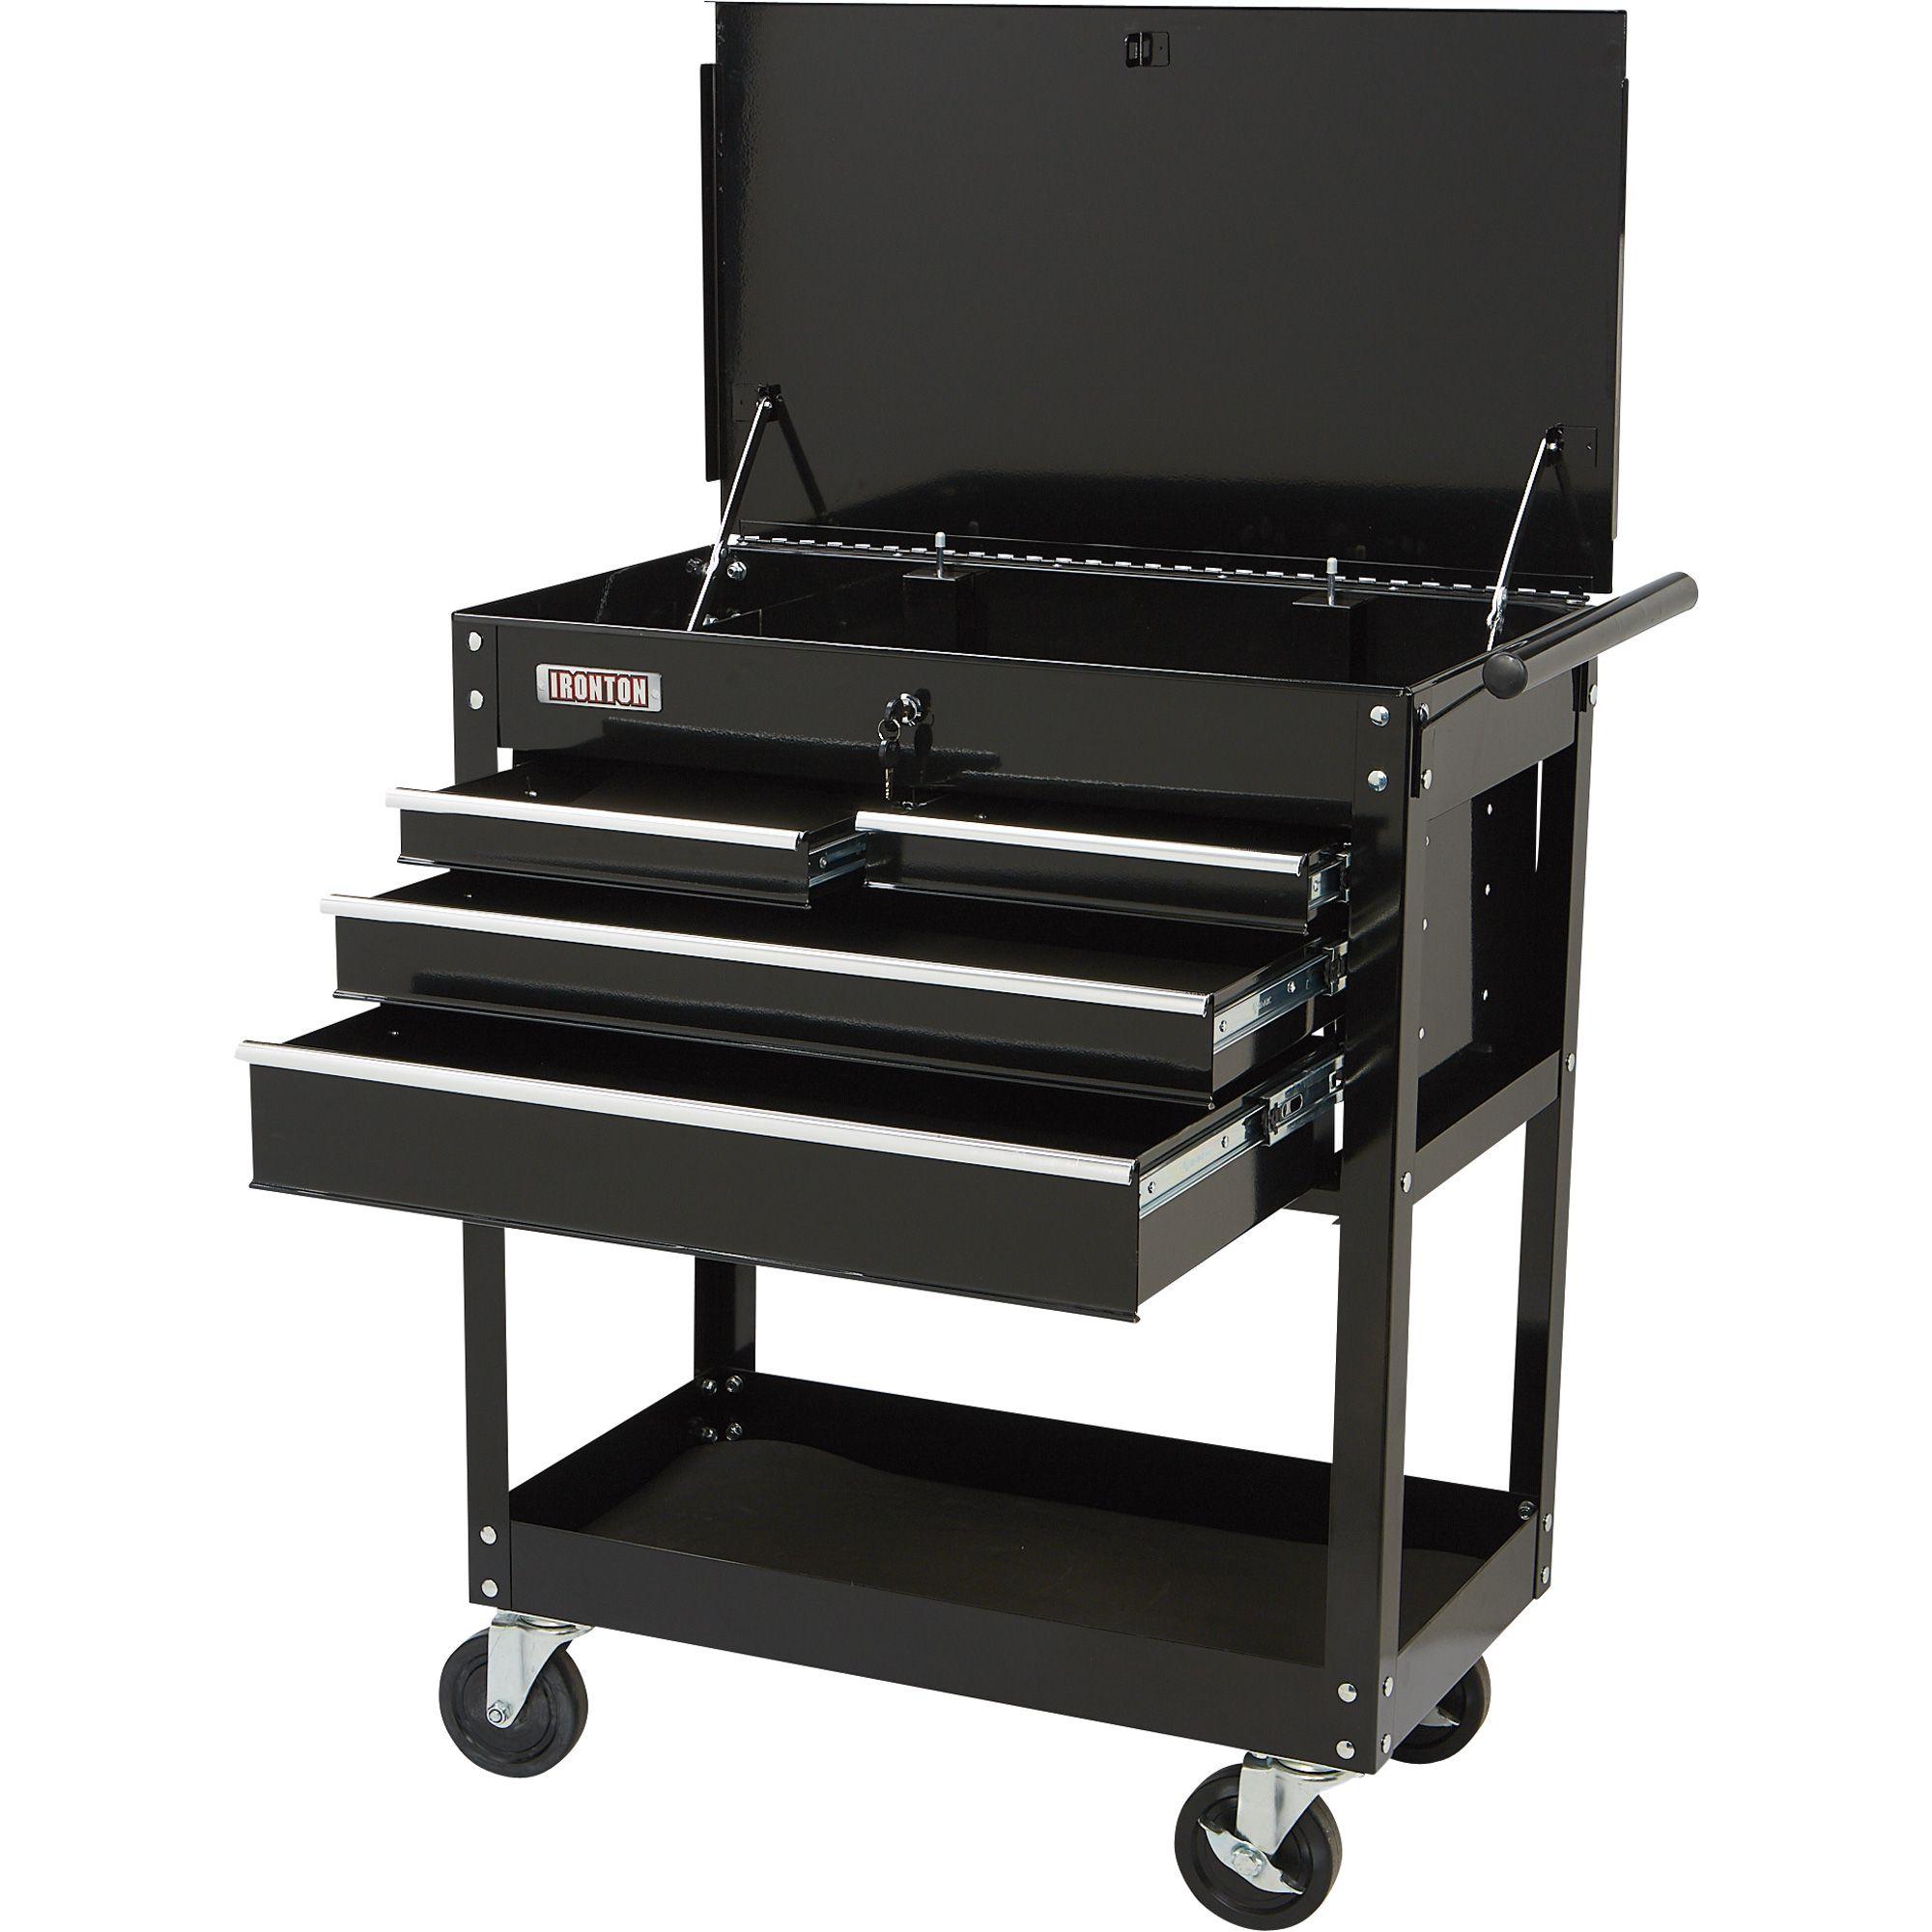 Large Storage Drawer Black Tuffy Teacher/'s Cushion Mobile Seat 4 Wheels